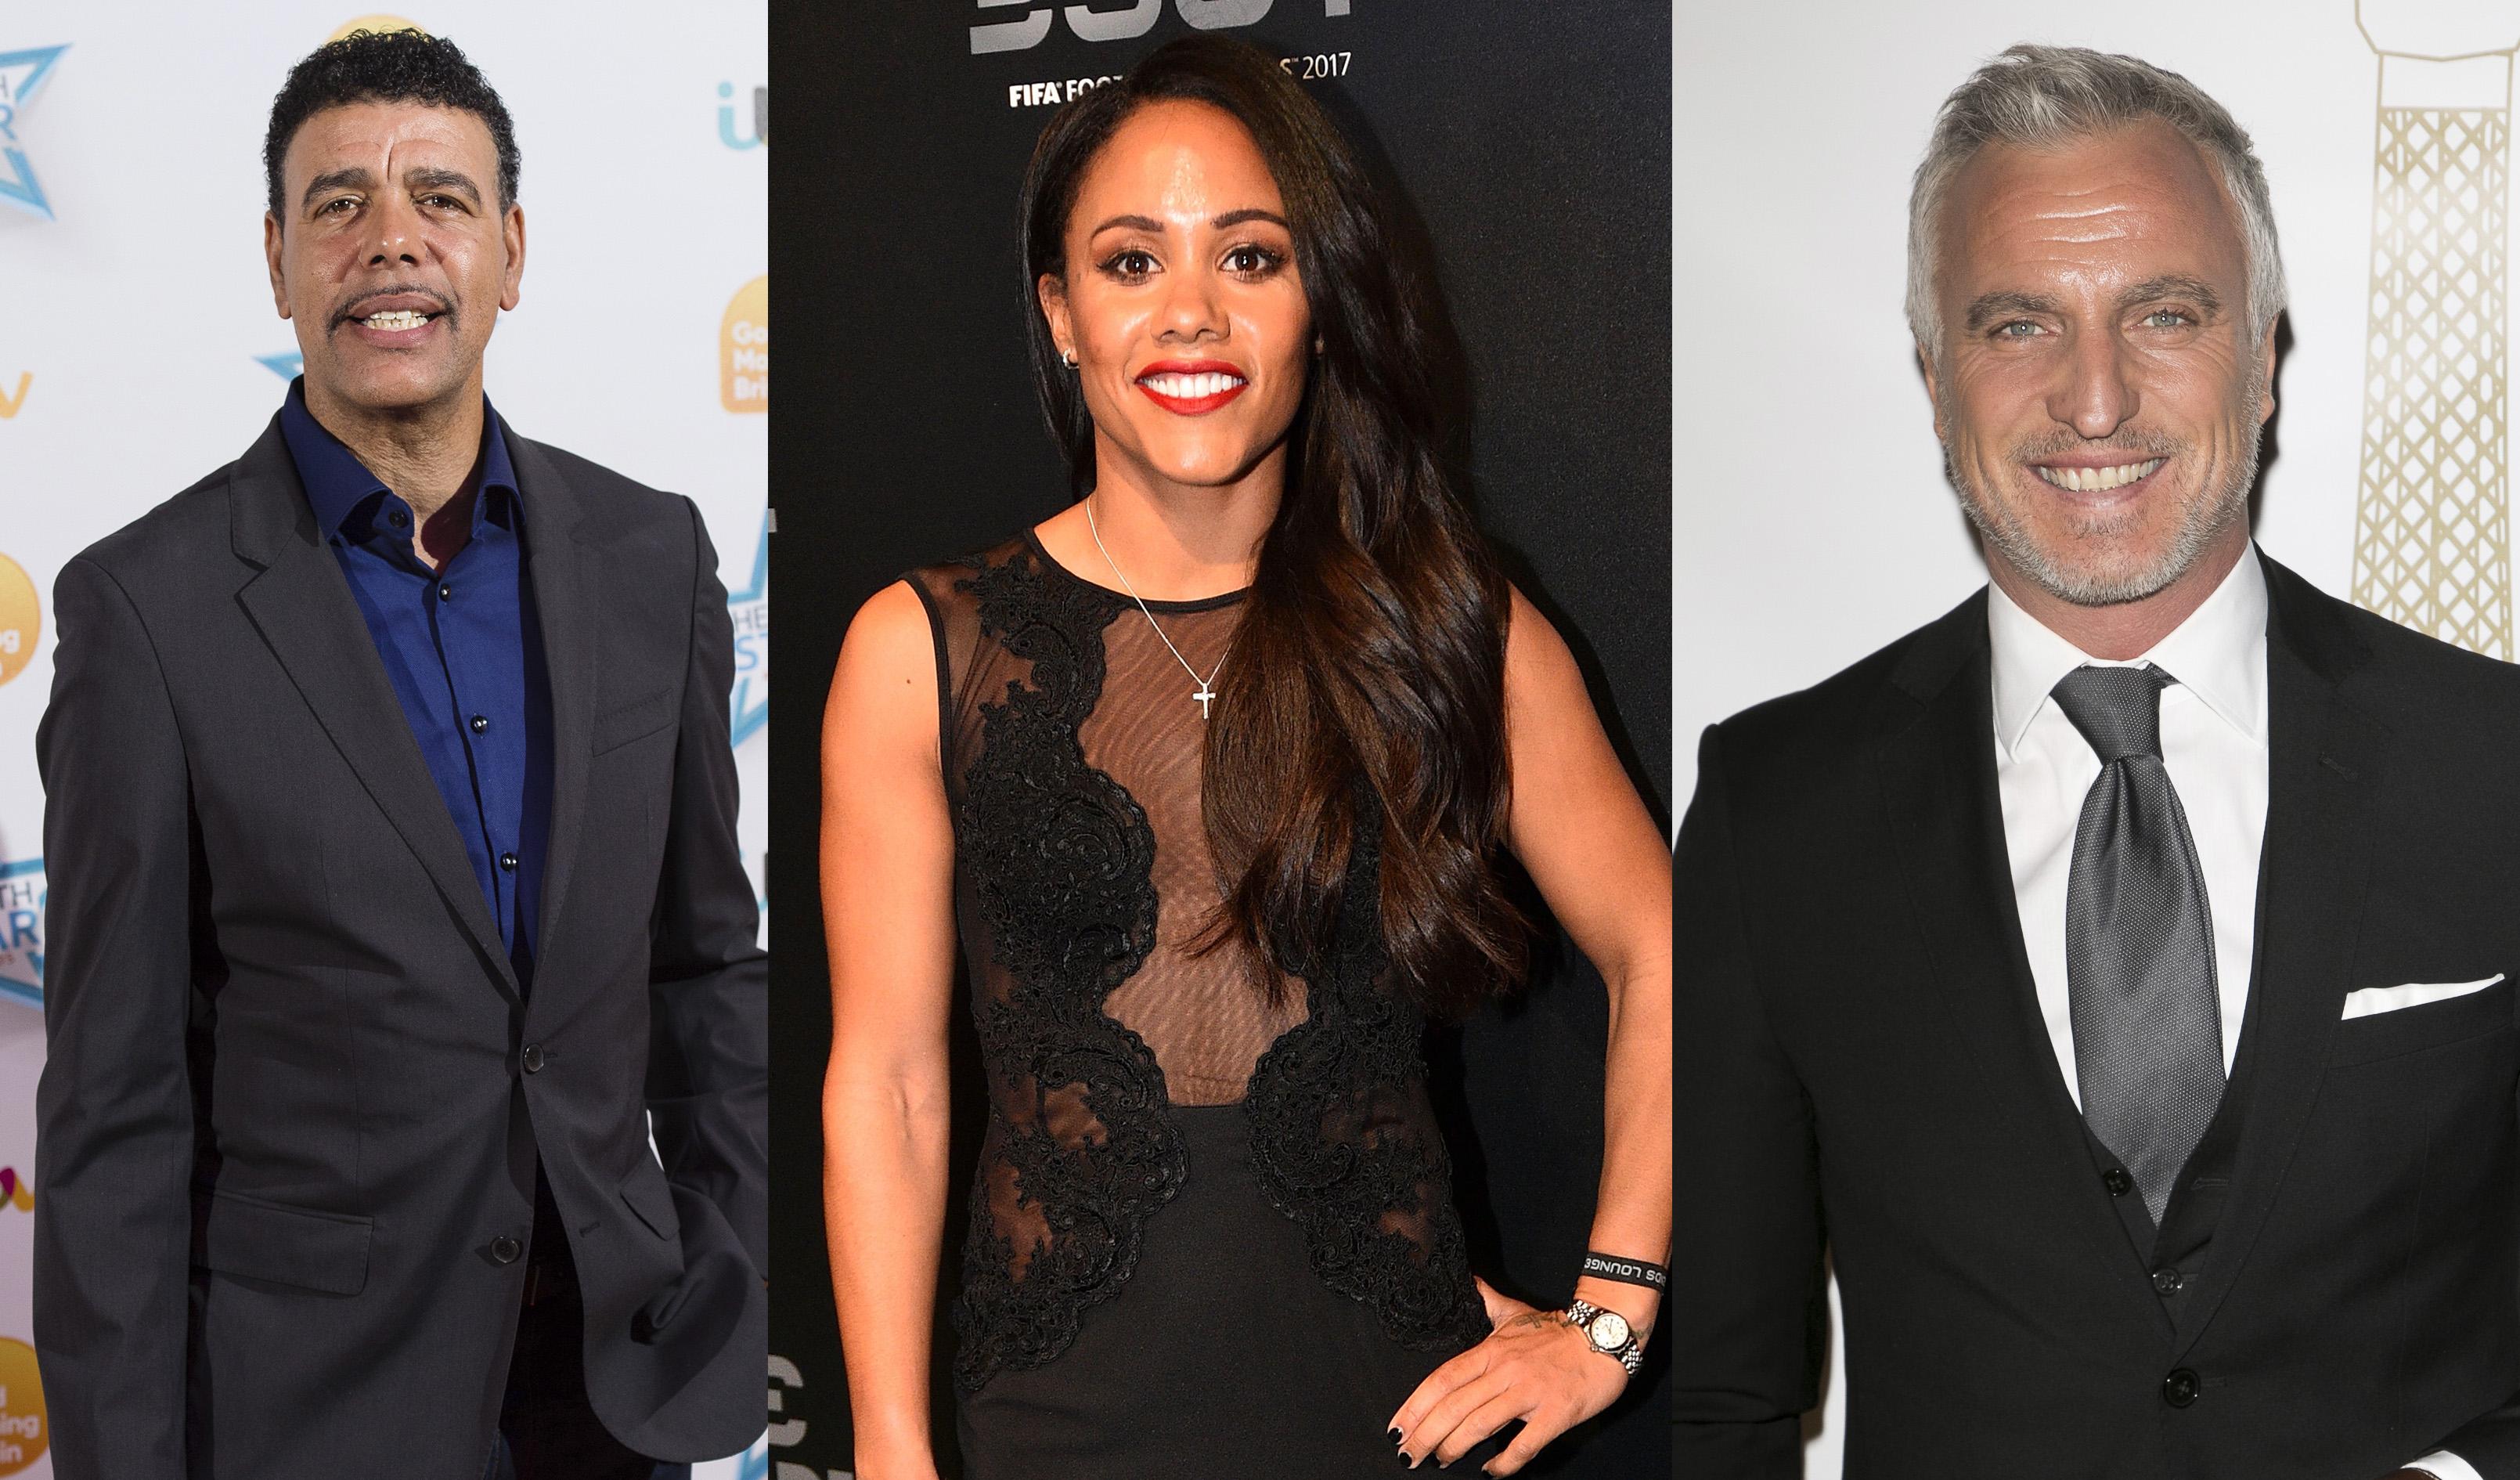 Strictly Come Dancing Sport Relief: Chris Kamara, Alex Scott, David Ginola